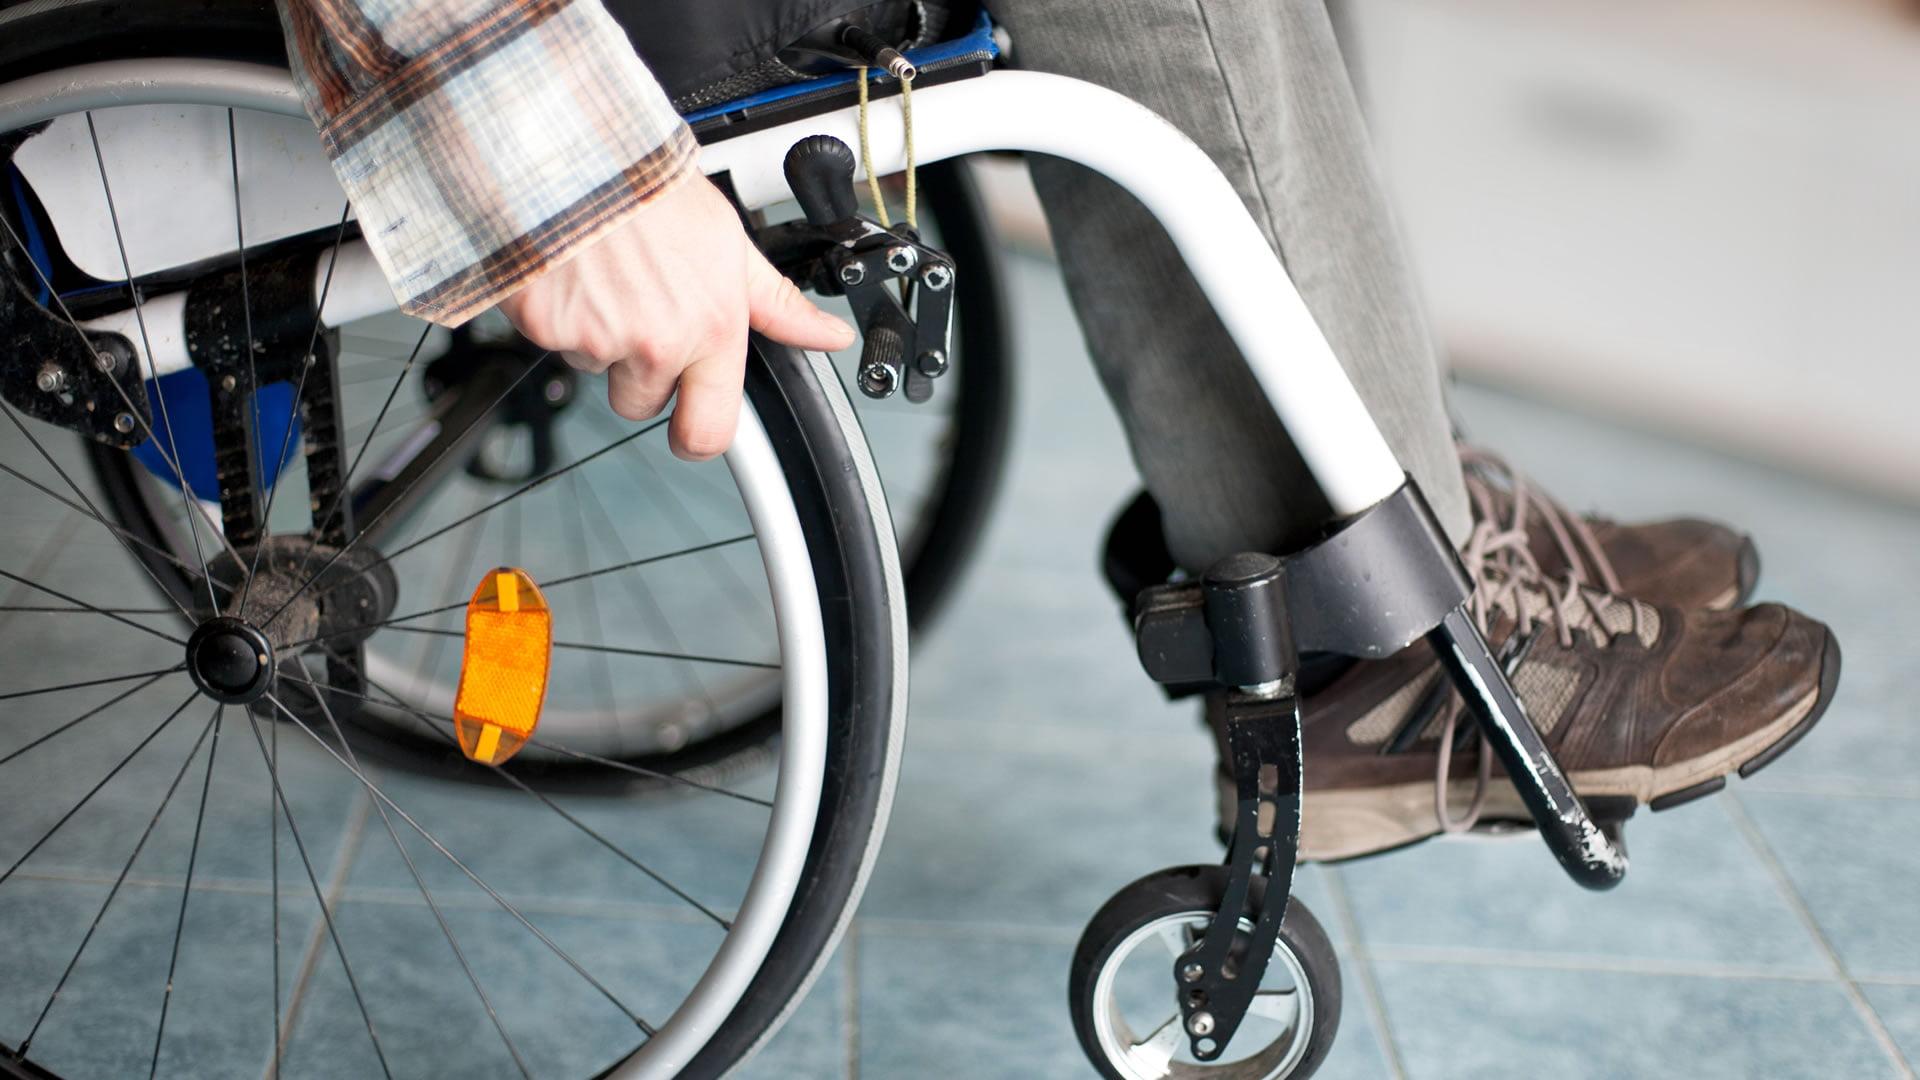 Ortopedia Plaza nos permite alquilar una silla de ruedas